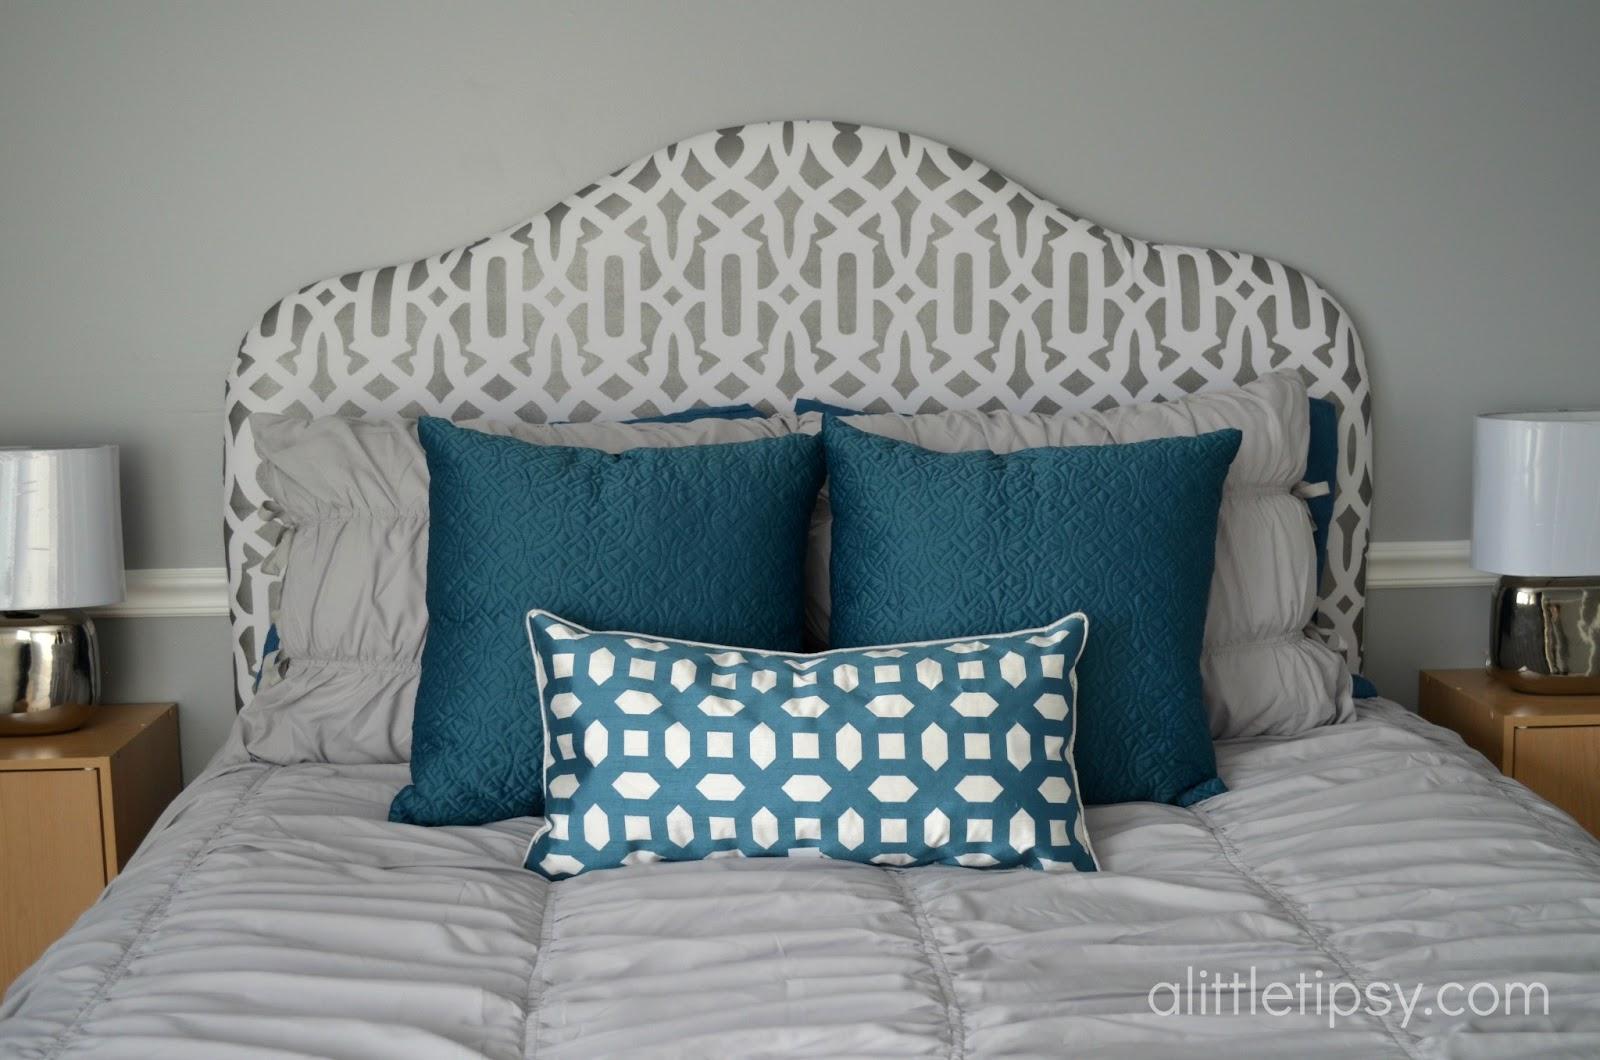 diy headboard a little tipsy. Black Bedroom Furniture Sets. Home Design Ideas